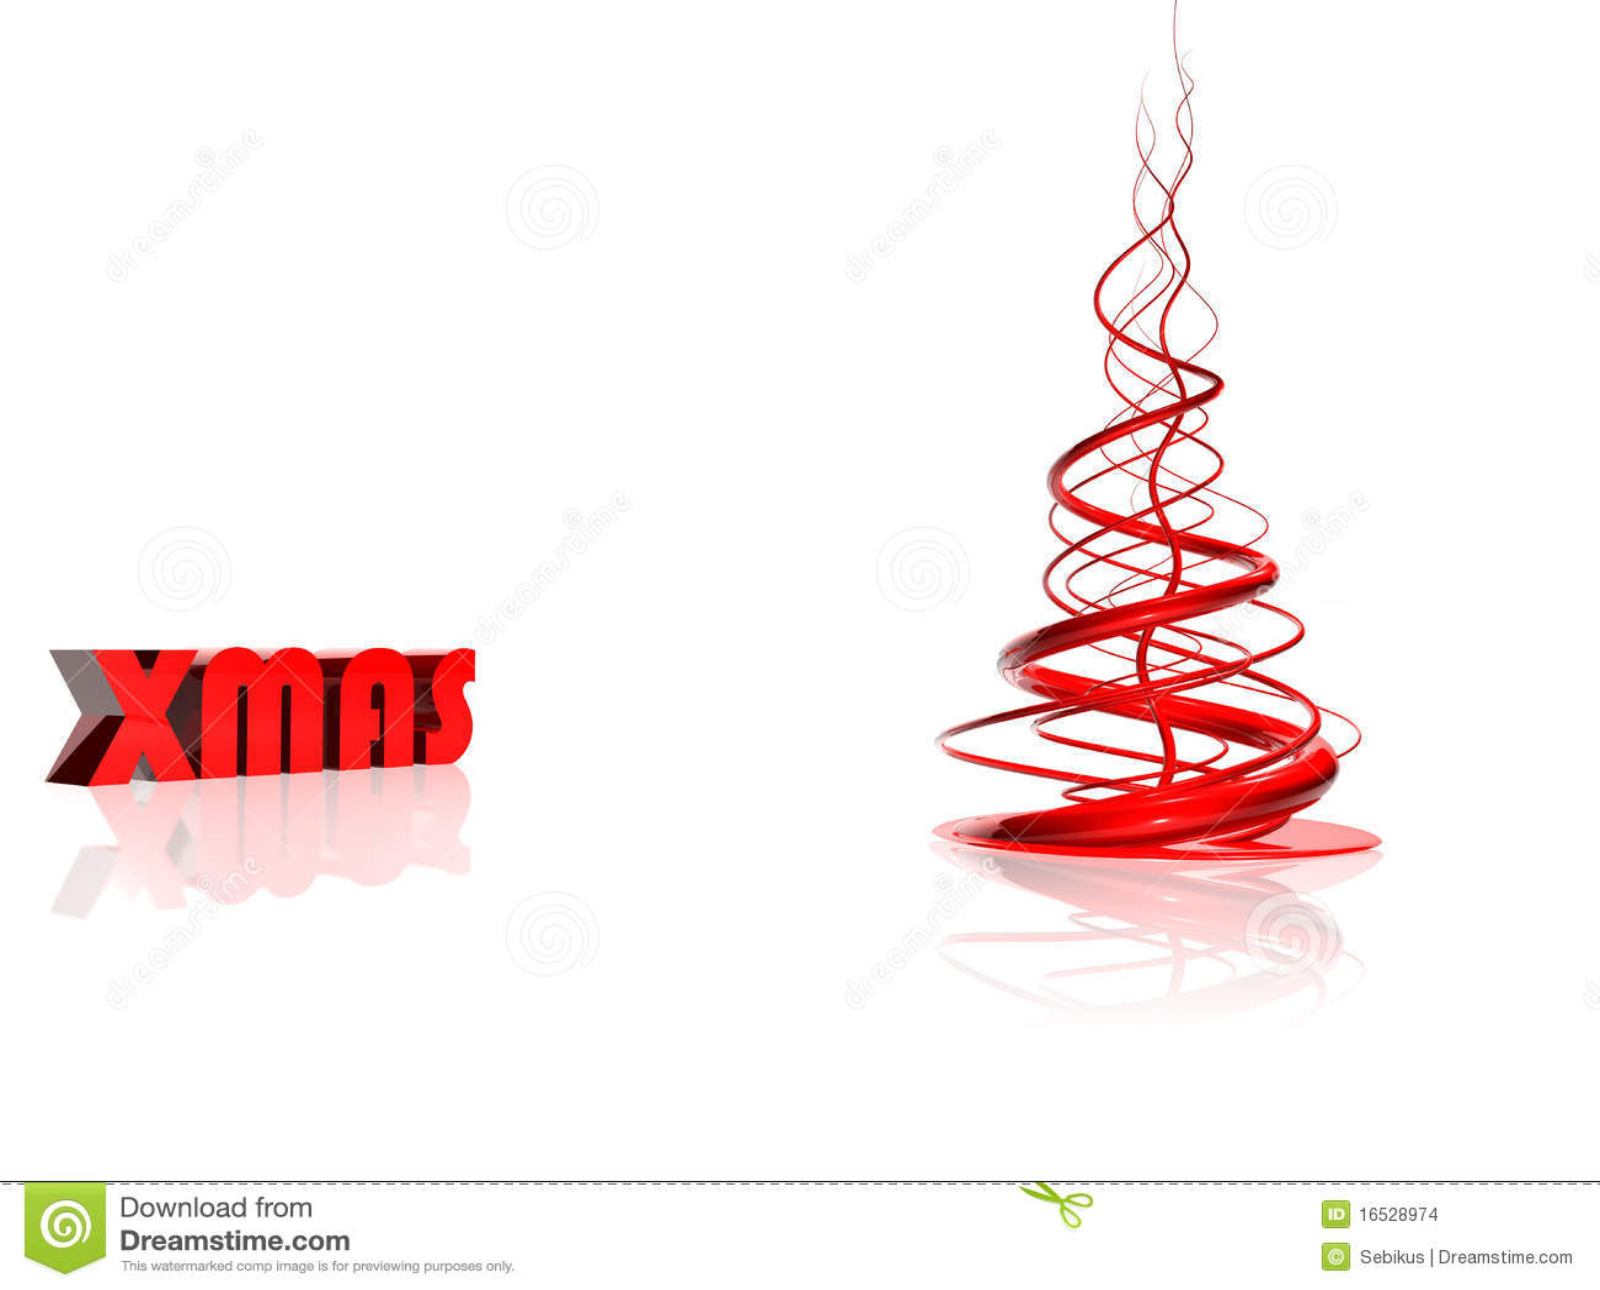 abstrakter roter weihnachtsbaum stockfoto bild 16528974. Black Bedroom Furniture Sets. Home Design Ideas